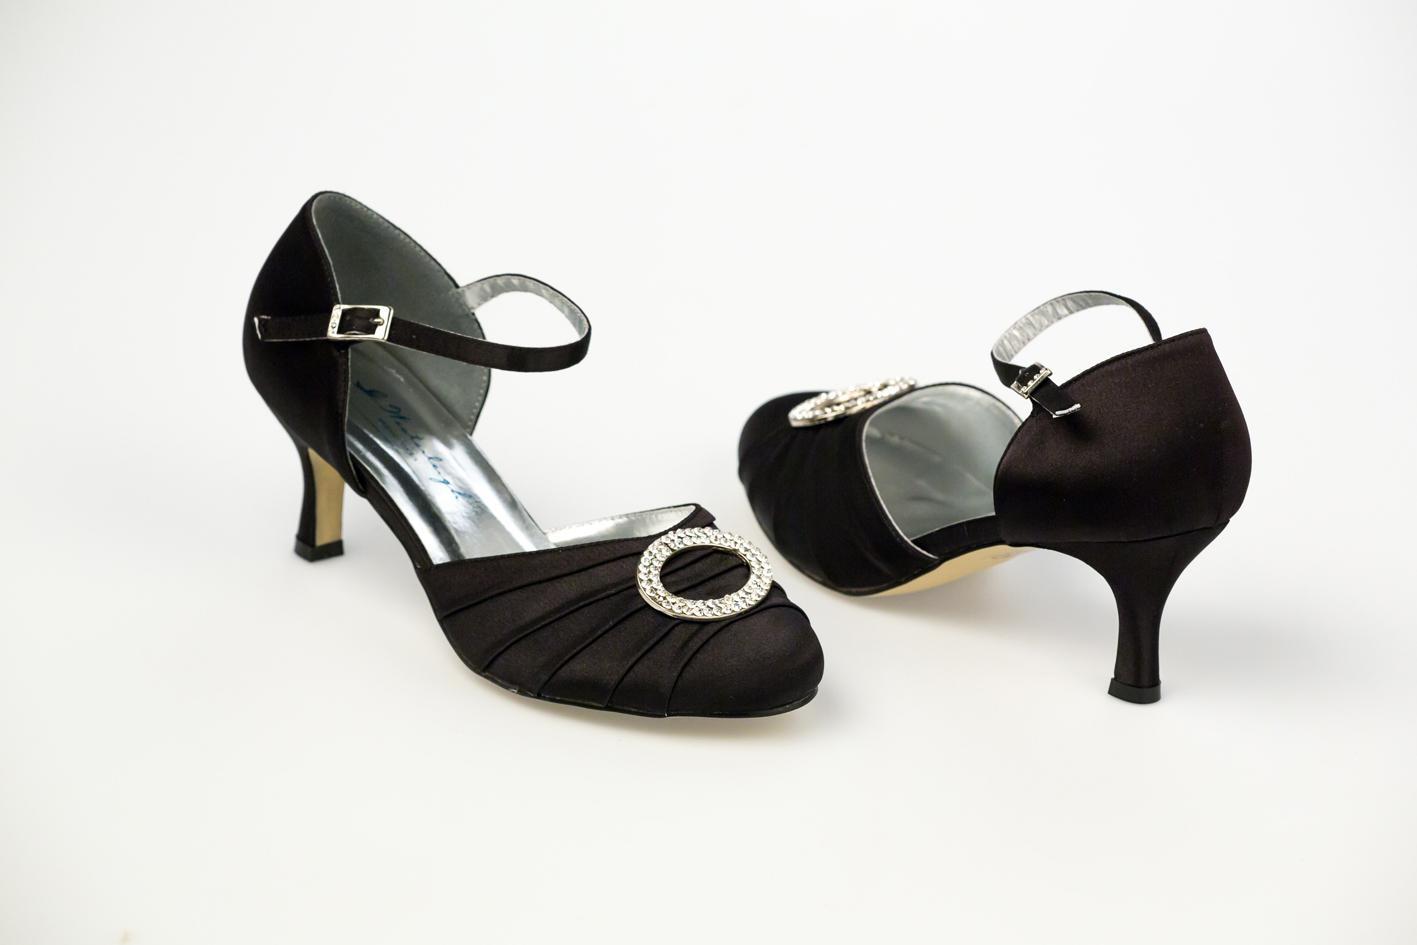 Spoločenské topánky Linda - Obrázok č. 4